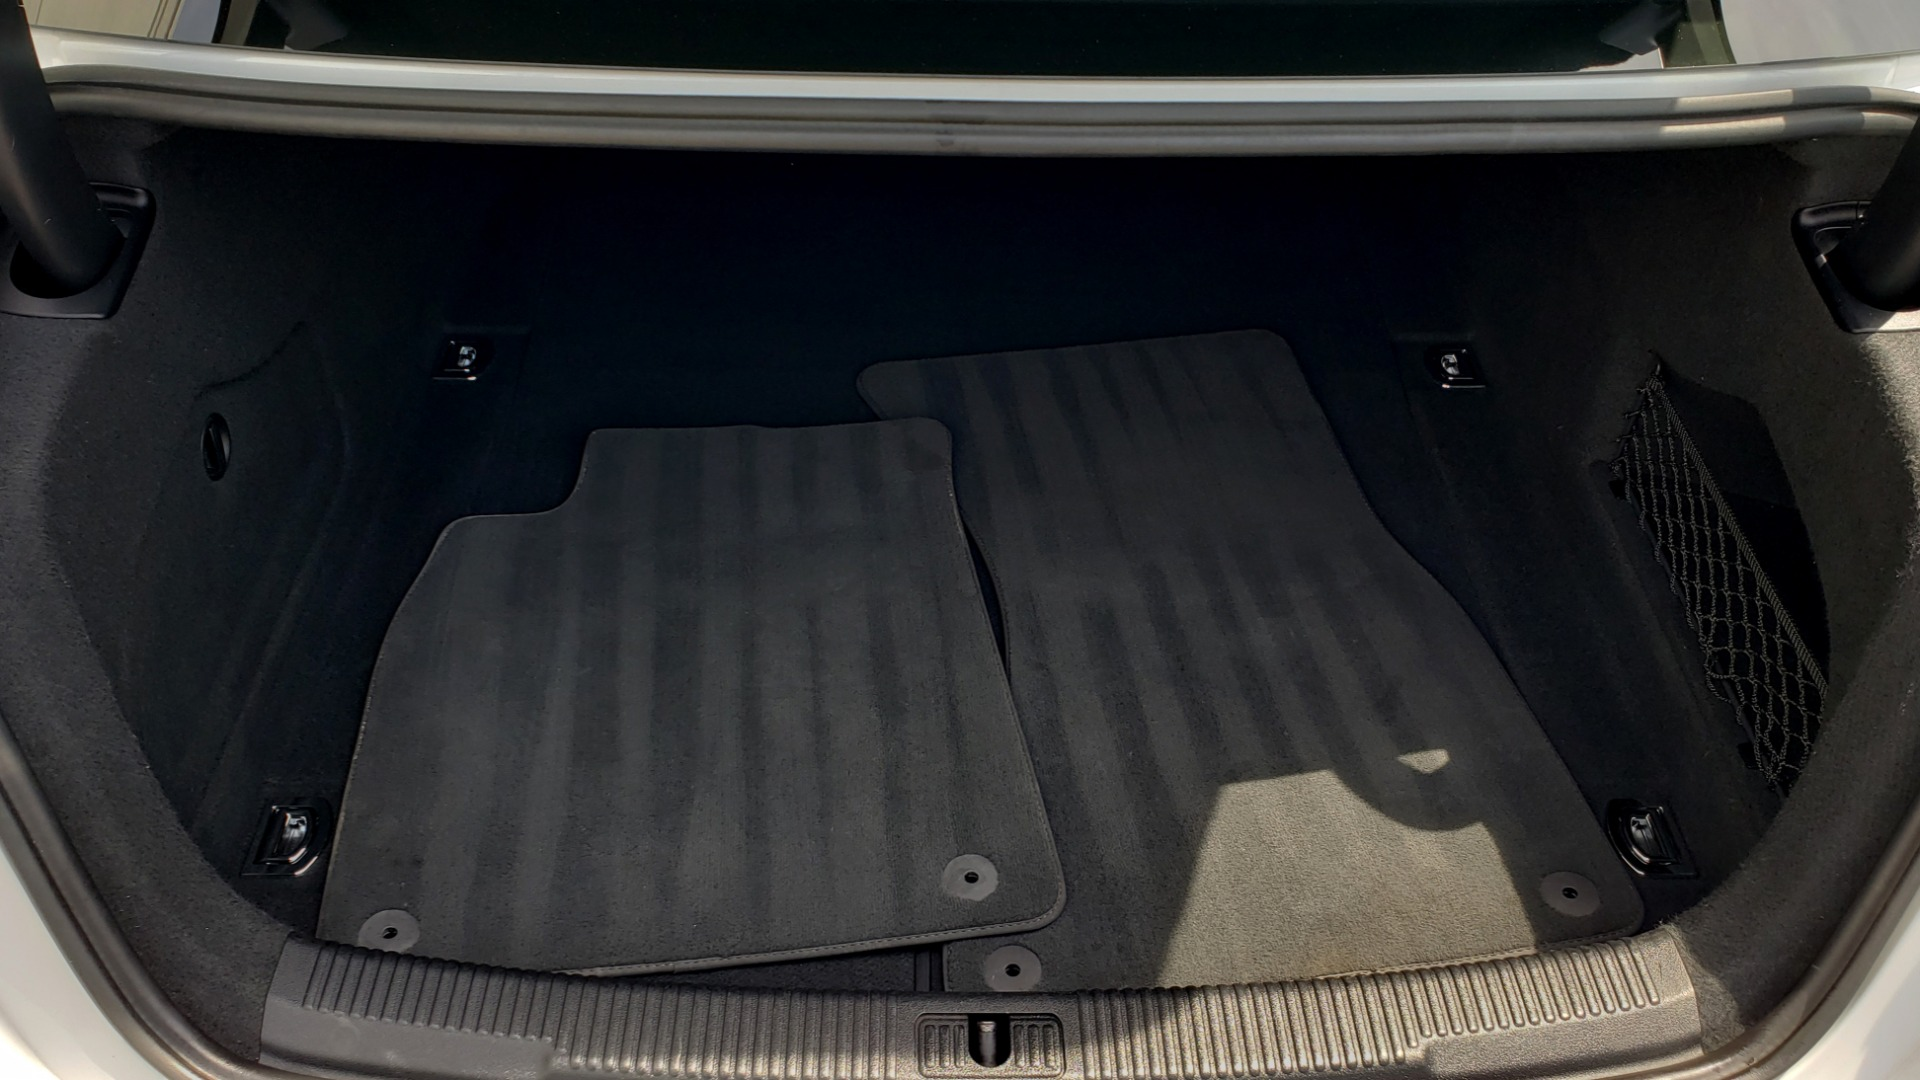 Used 2017 Audi A6 PRESTIGE SEDAN 3.0T / NAV / SUNROOF / BLACK OPTIC / CLD WTHR / REARVIEW for sale $30,797 at Formula Imports in Charlotte NC 28227 18